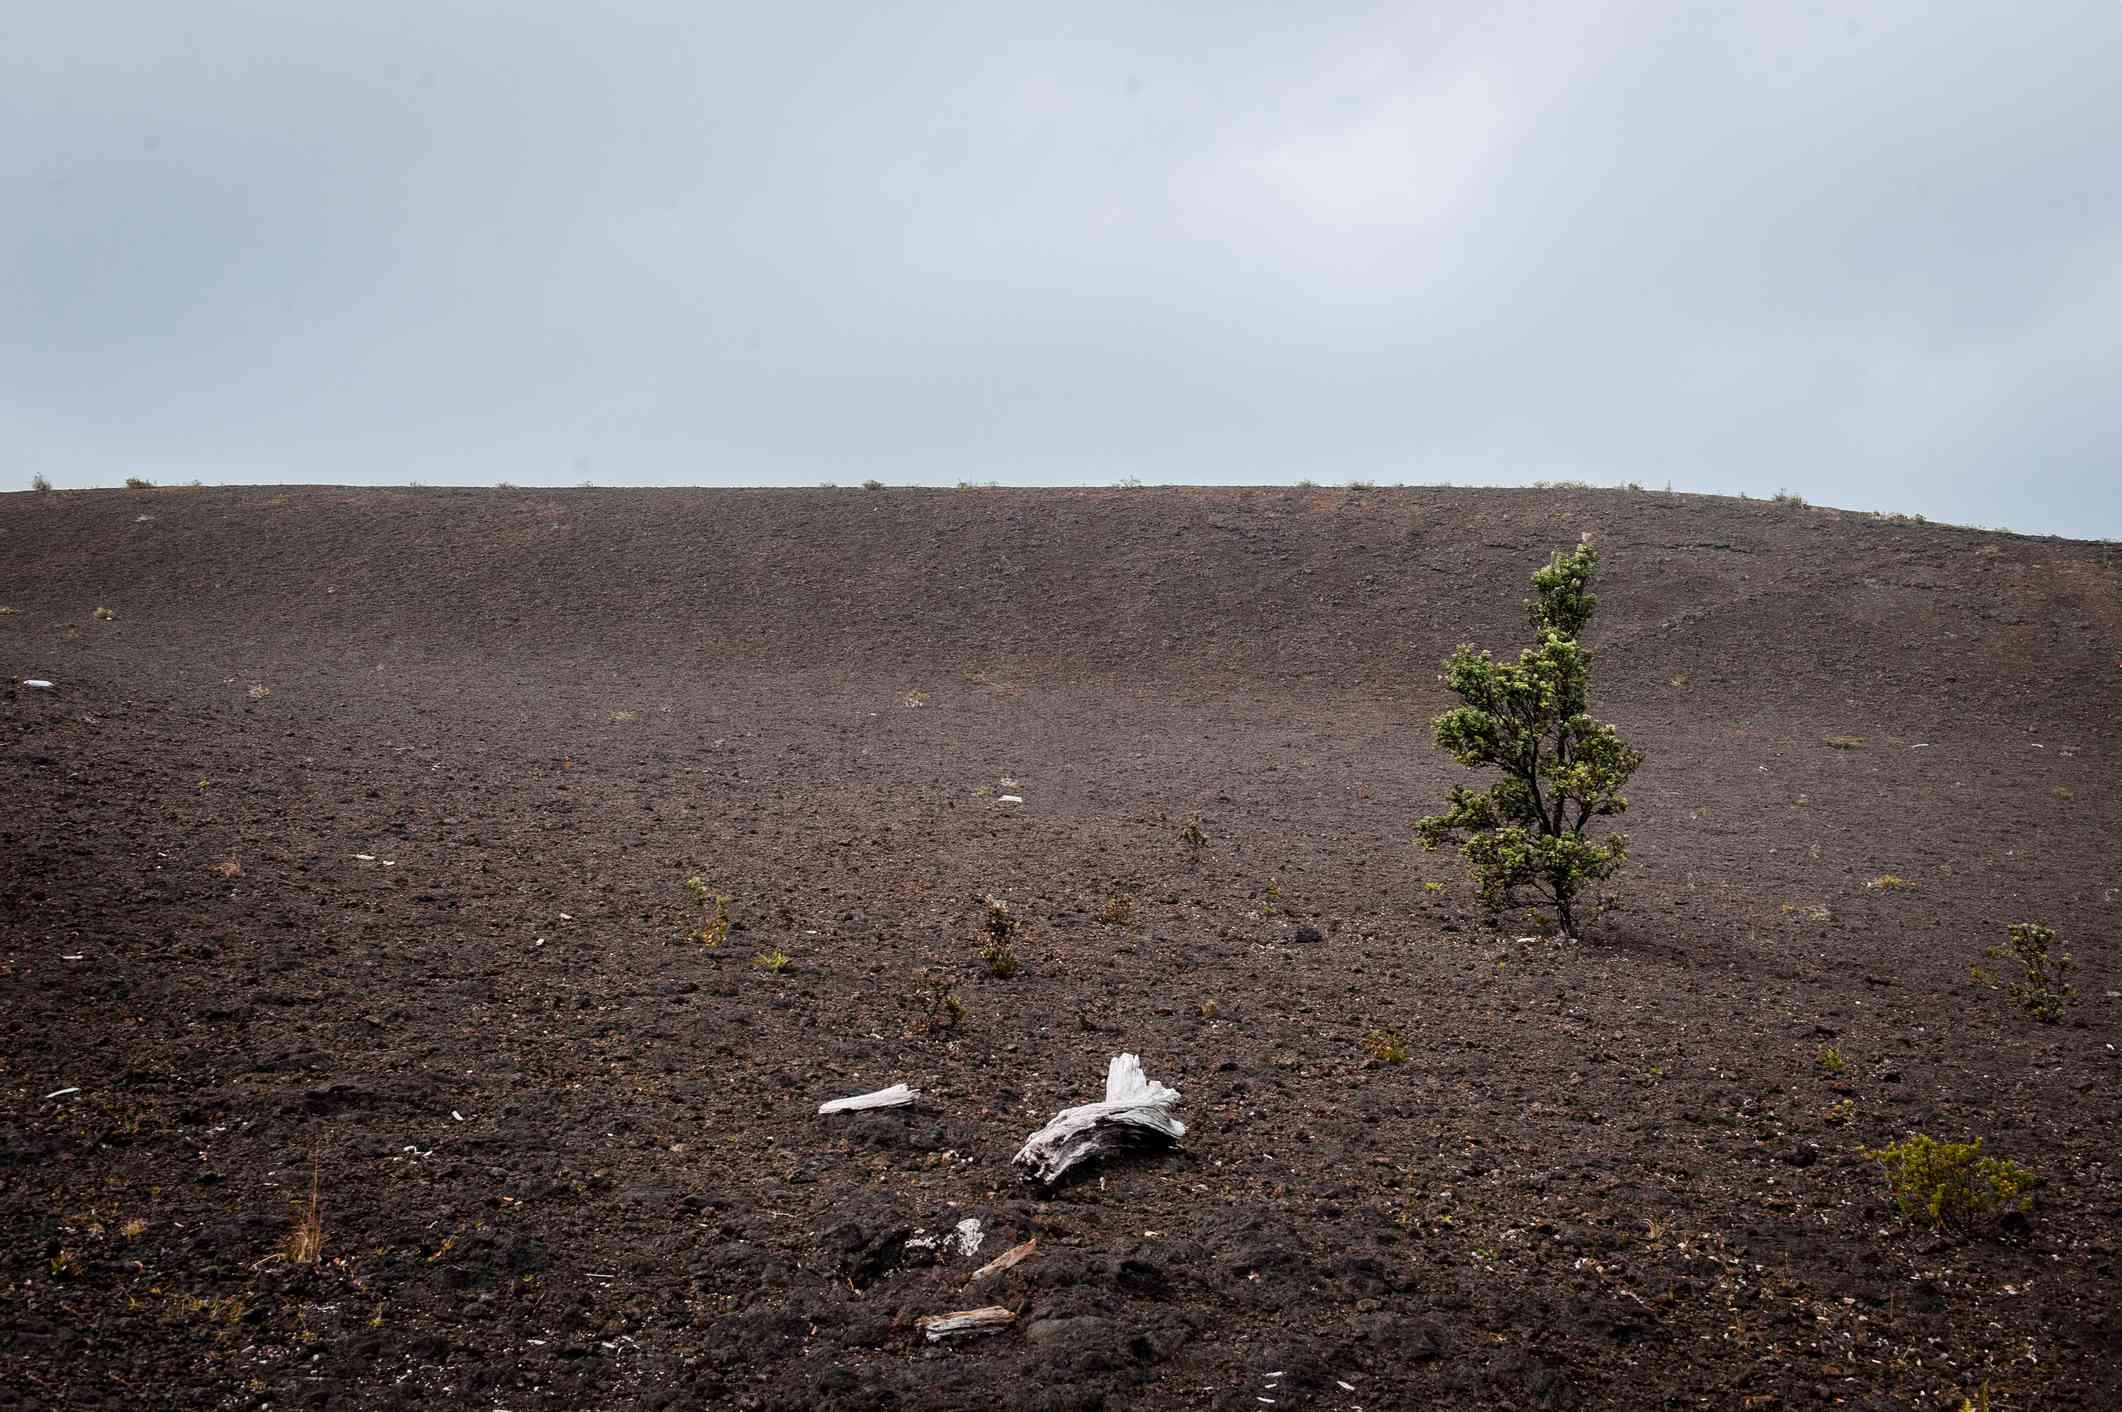 Devastation Trail, Hawaii Volcanoes National Park